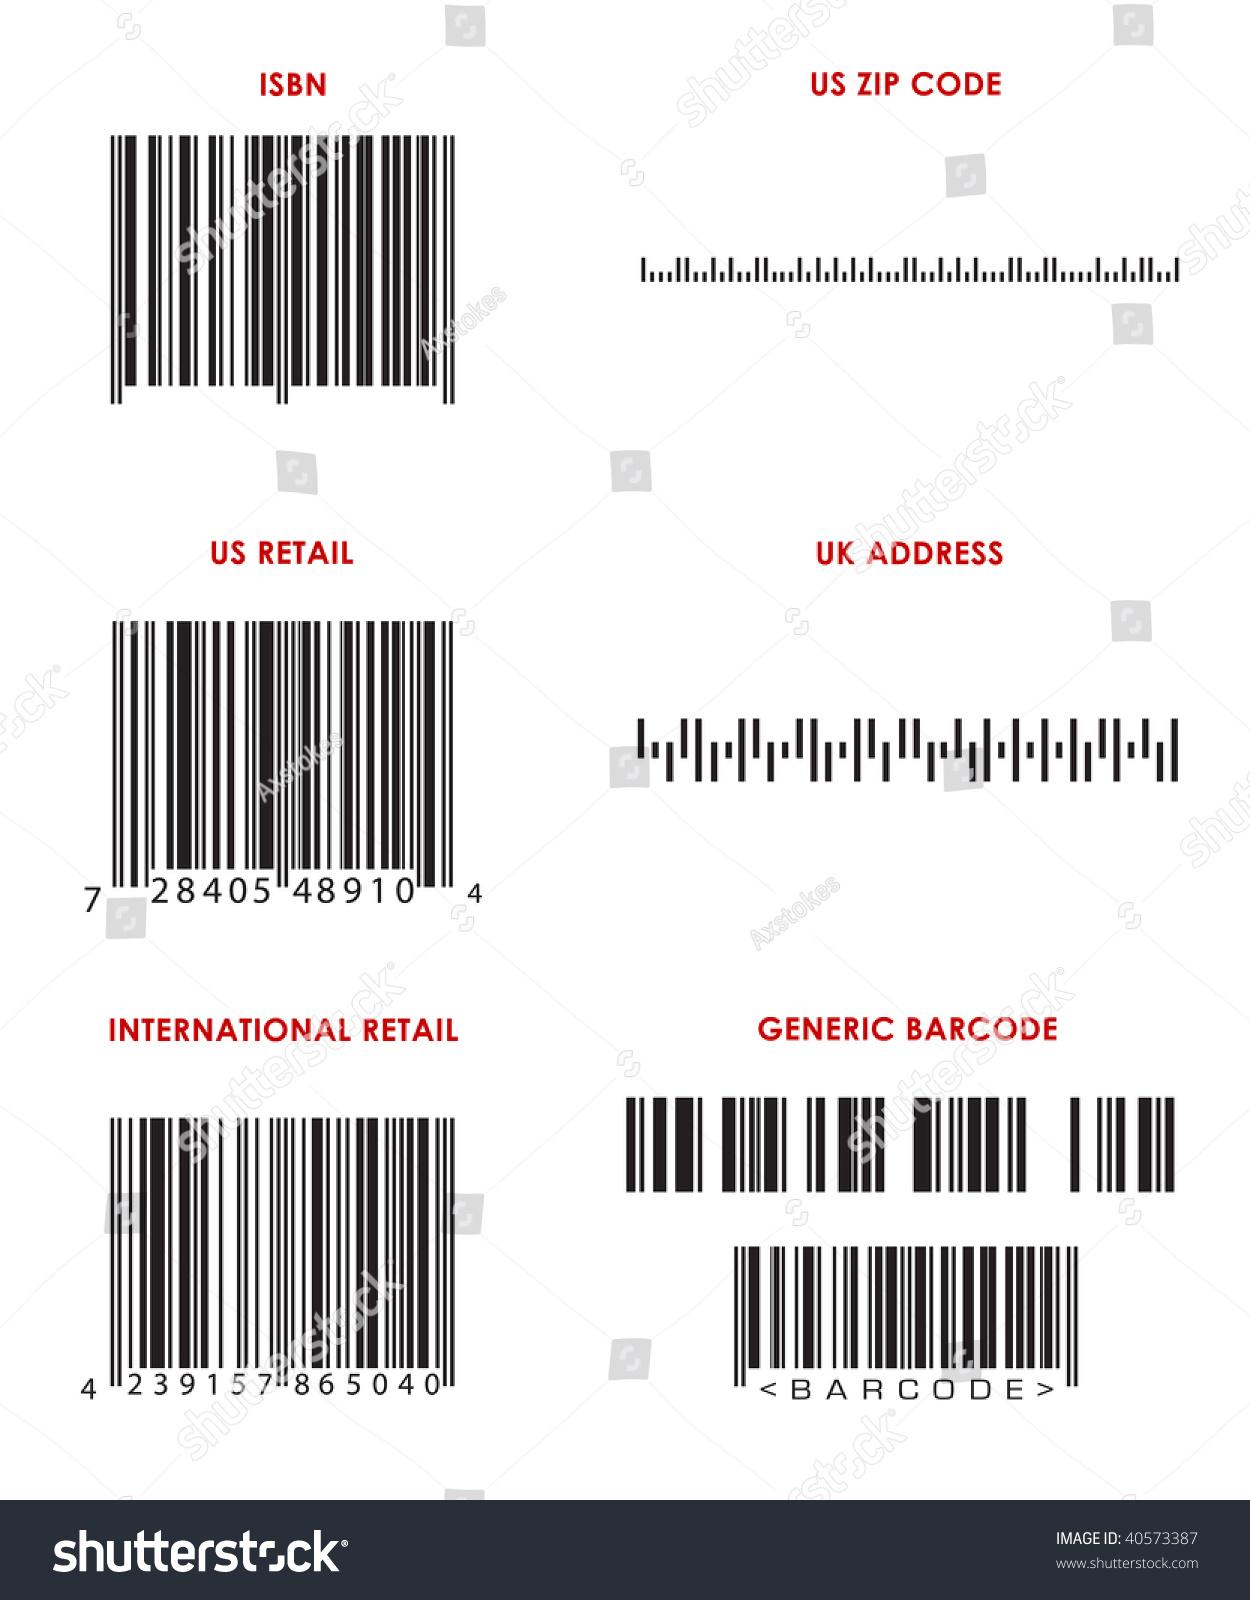 bar codes various formats upc isbn stock illustration. Black Bedroom Furniture Sets. Home Design Ideas